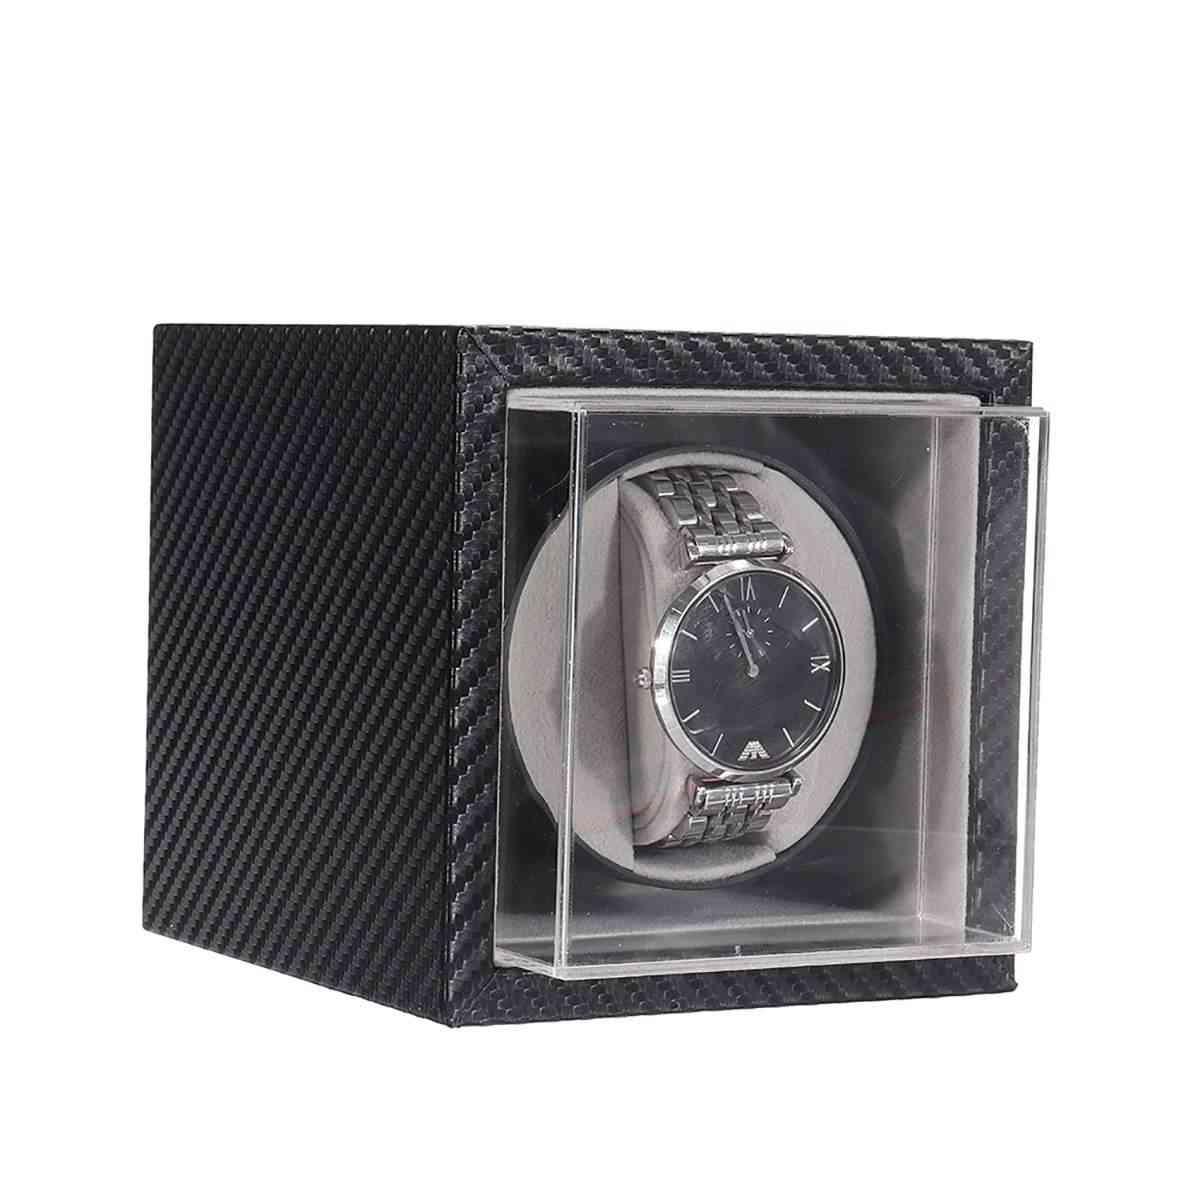 Automatic Watch Winder, Mute Motor Shaker, Carbon Fiber Watches Box